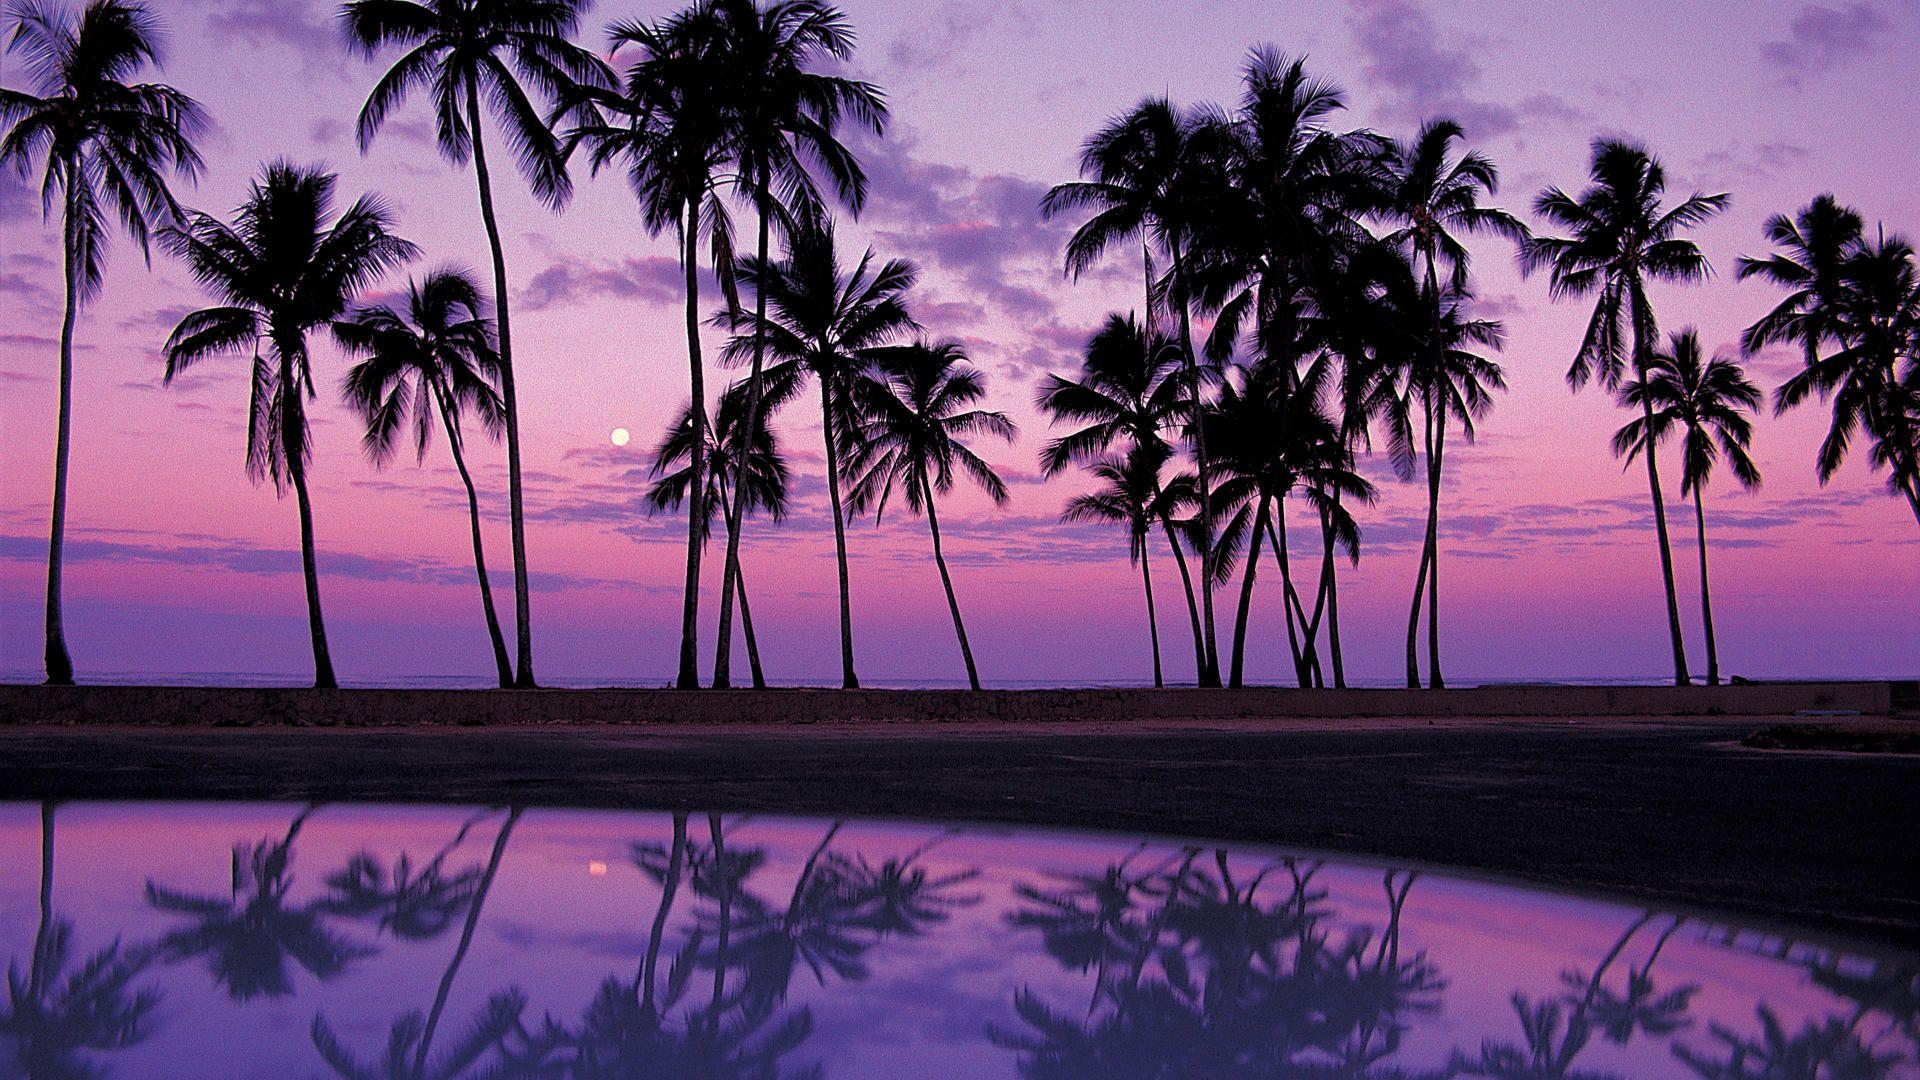 Laptop Backgrounds 15 Amazing Pictures Negeblog Com Beach Sunset Wallpaper Sunset Wallpaper Purple Sunset